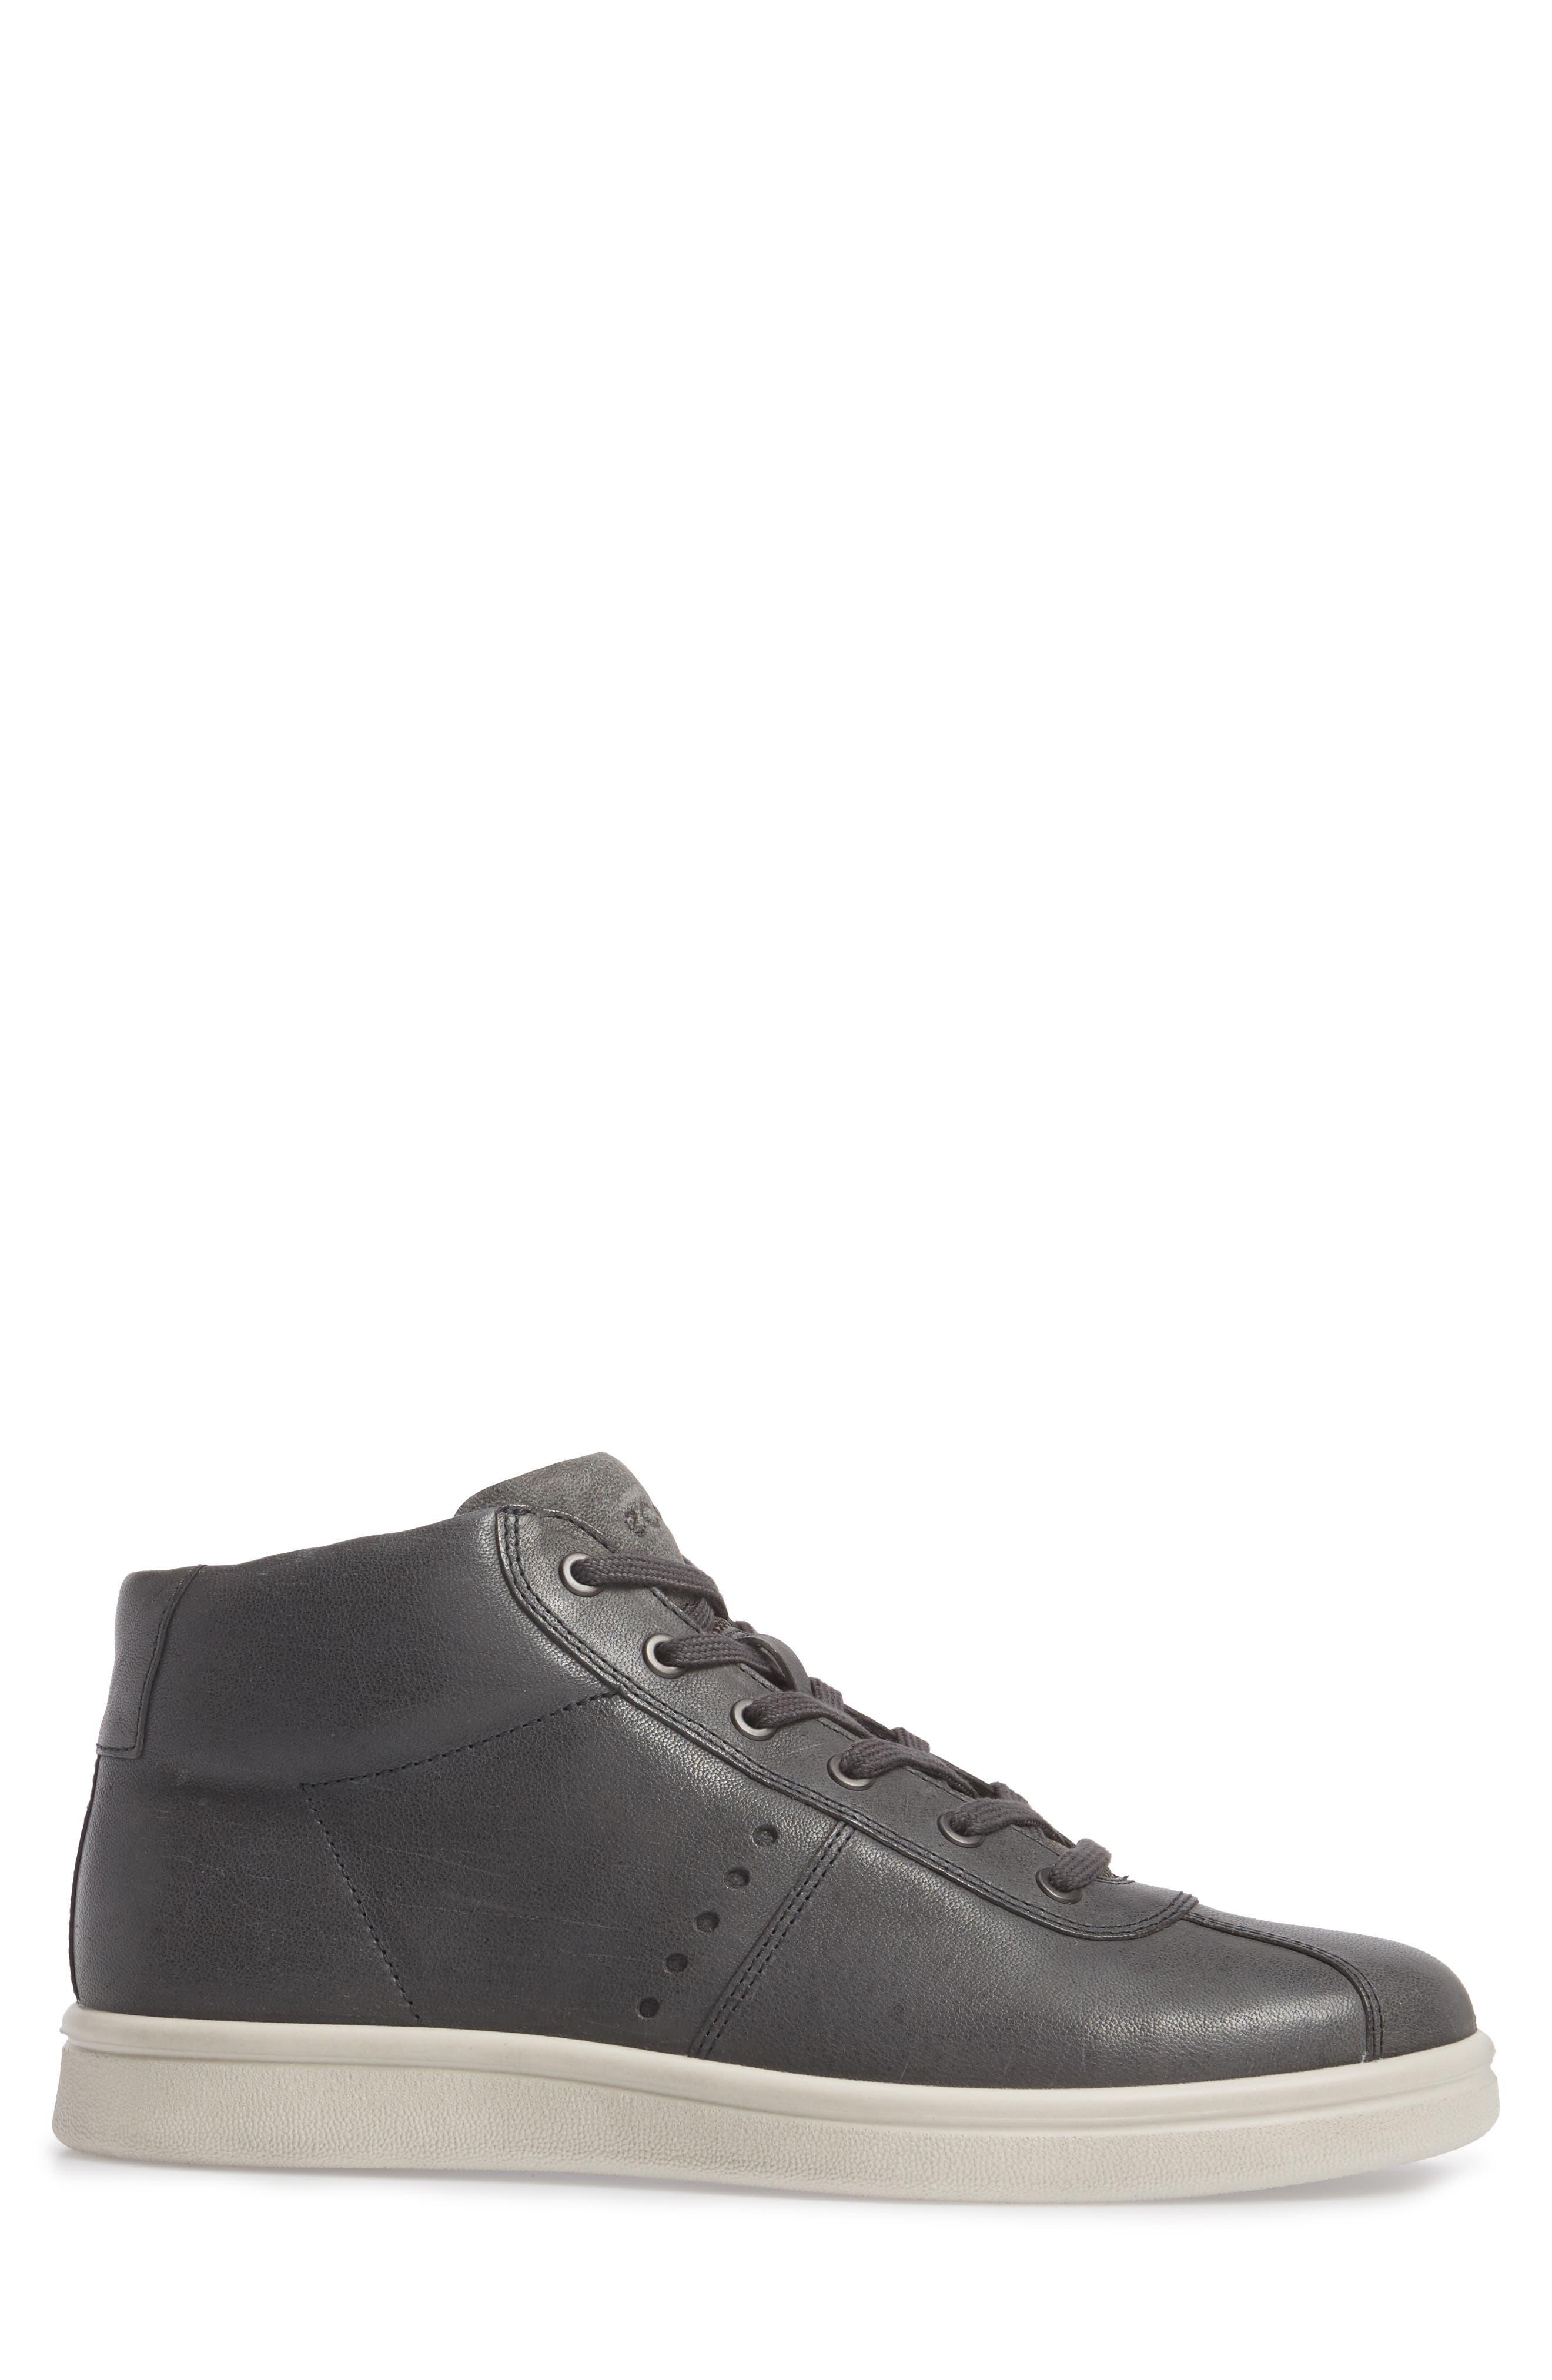 Kallum High Top Sneaker,                             Alternate thumbnail 3, color,                             078